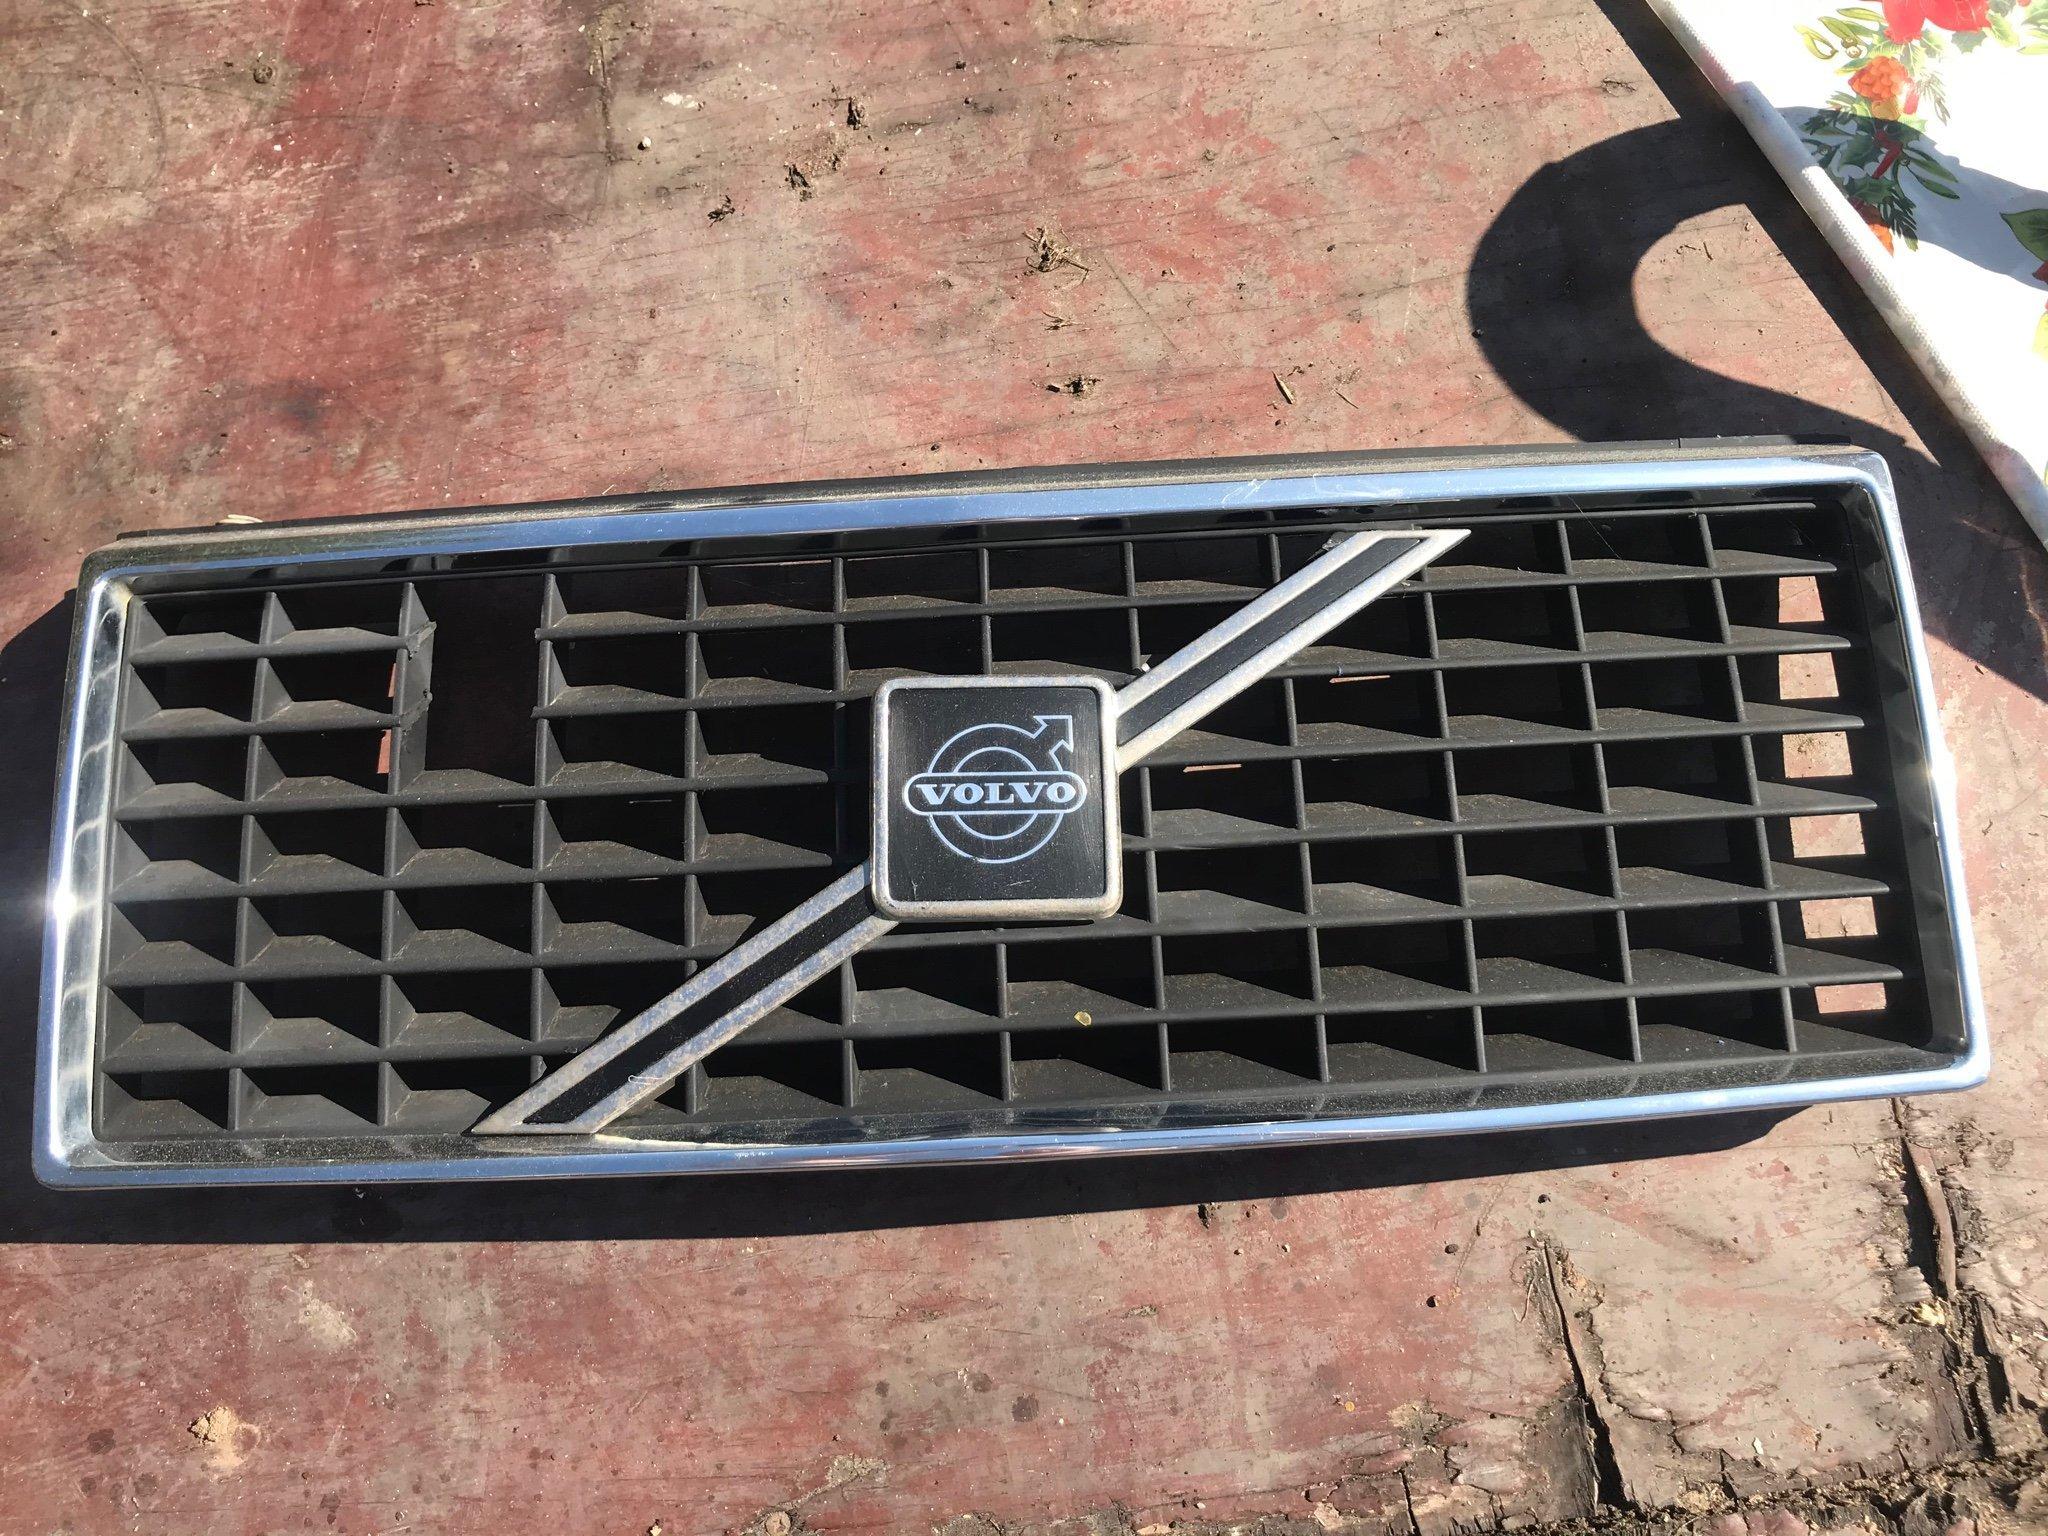 Volvo 240 Turbo grill. Volvo grill, turbogrill (412860381